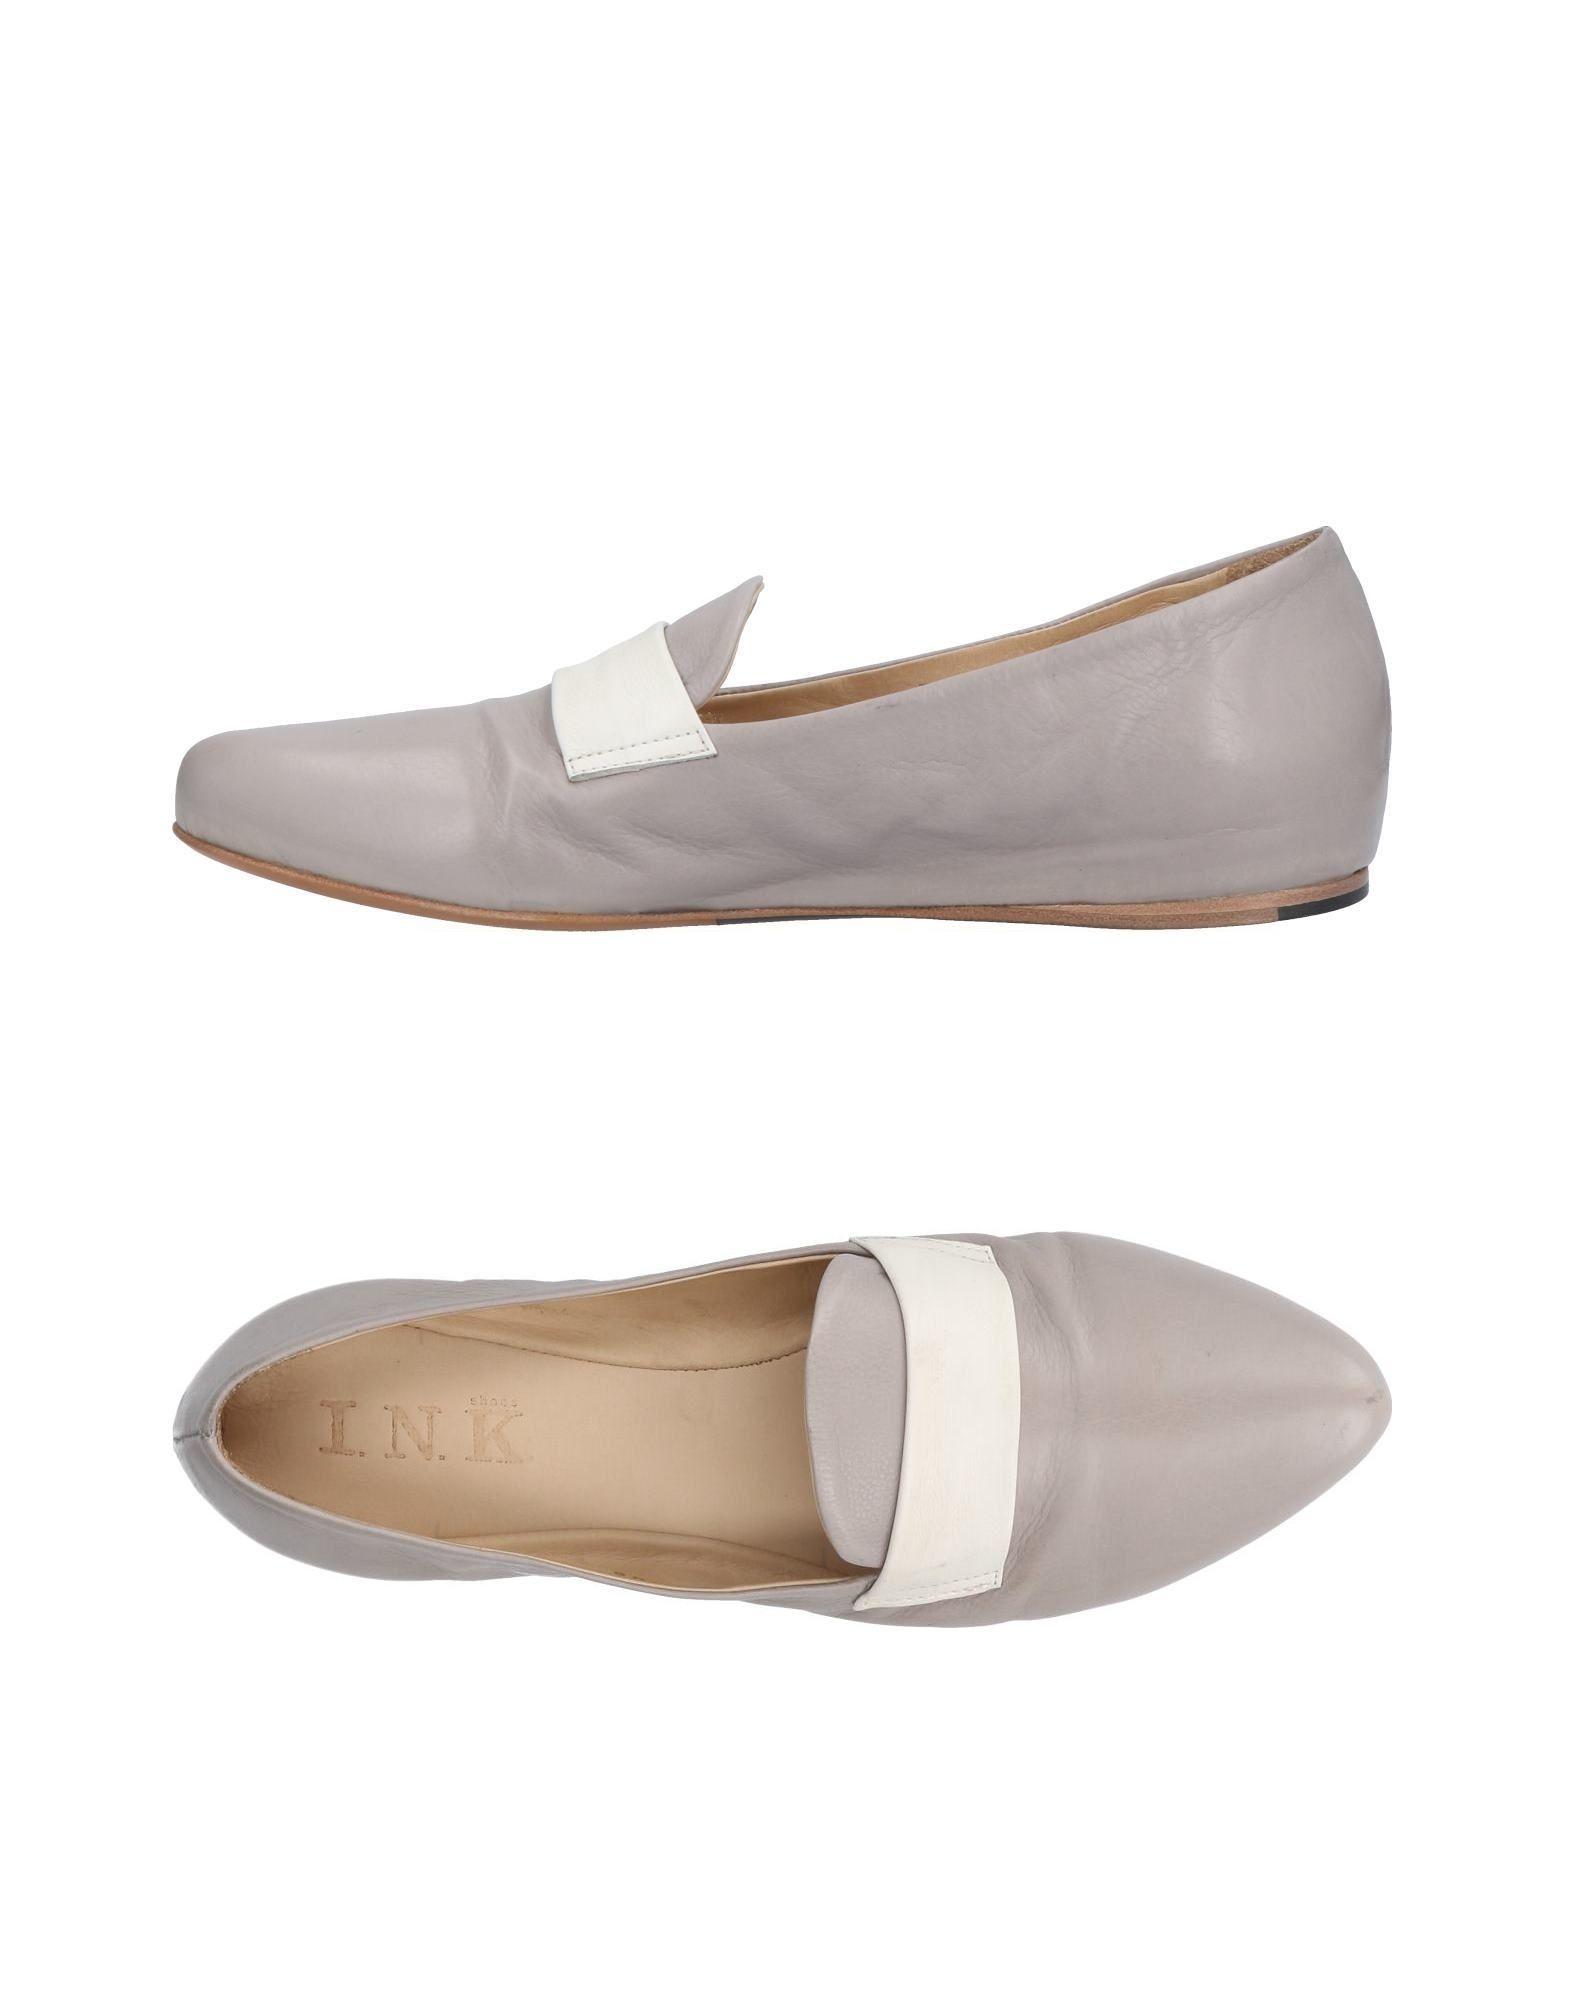 Mocassino I.N.K. Shoes Donna - Acquista online su